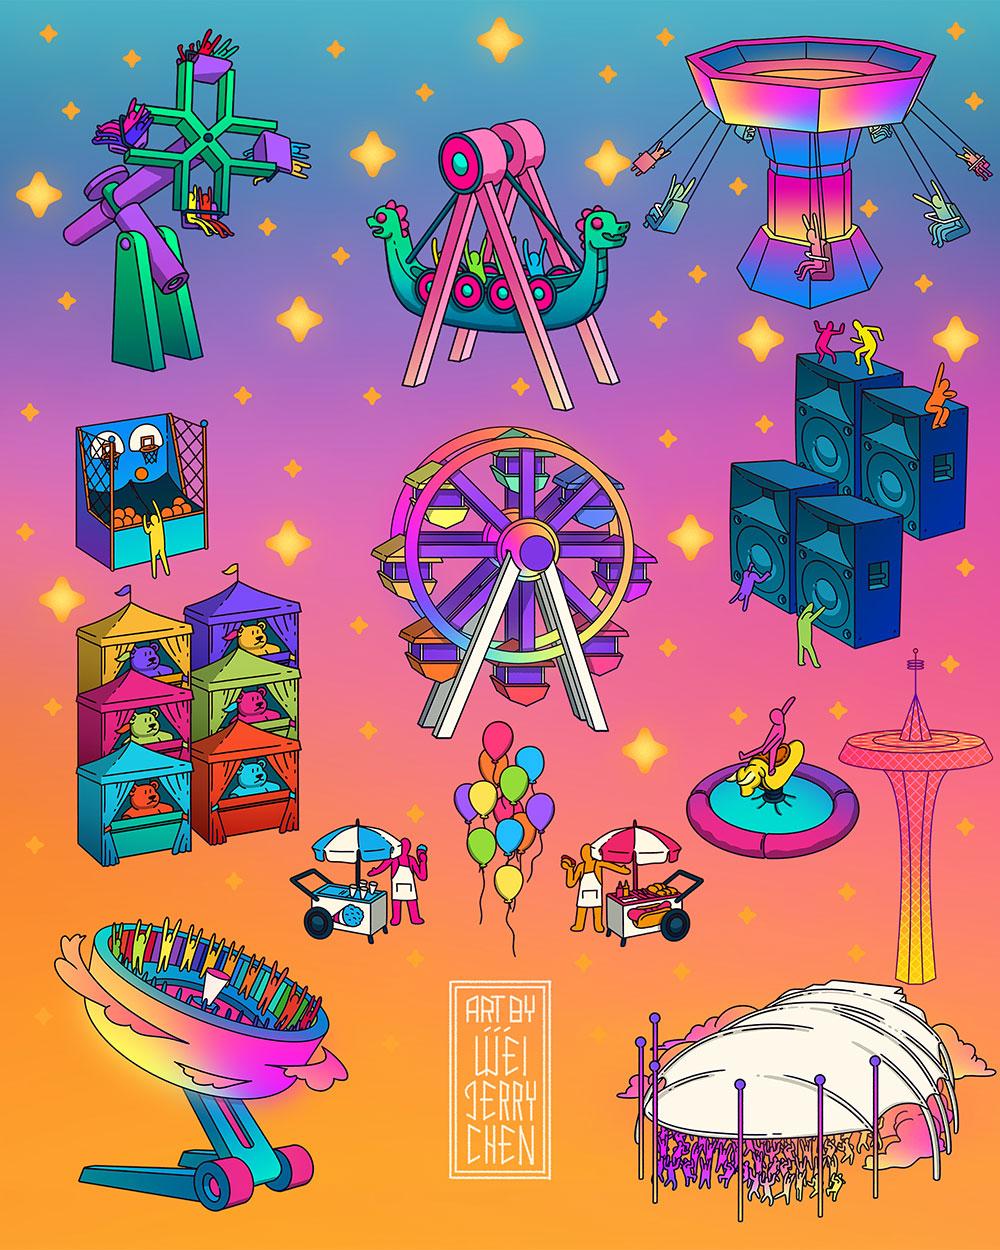 MISC Illustration assets for  TheGreatestDayEver  Festival